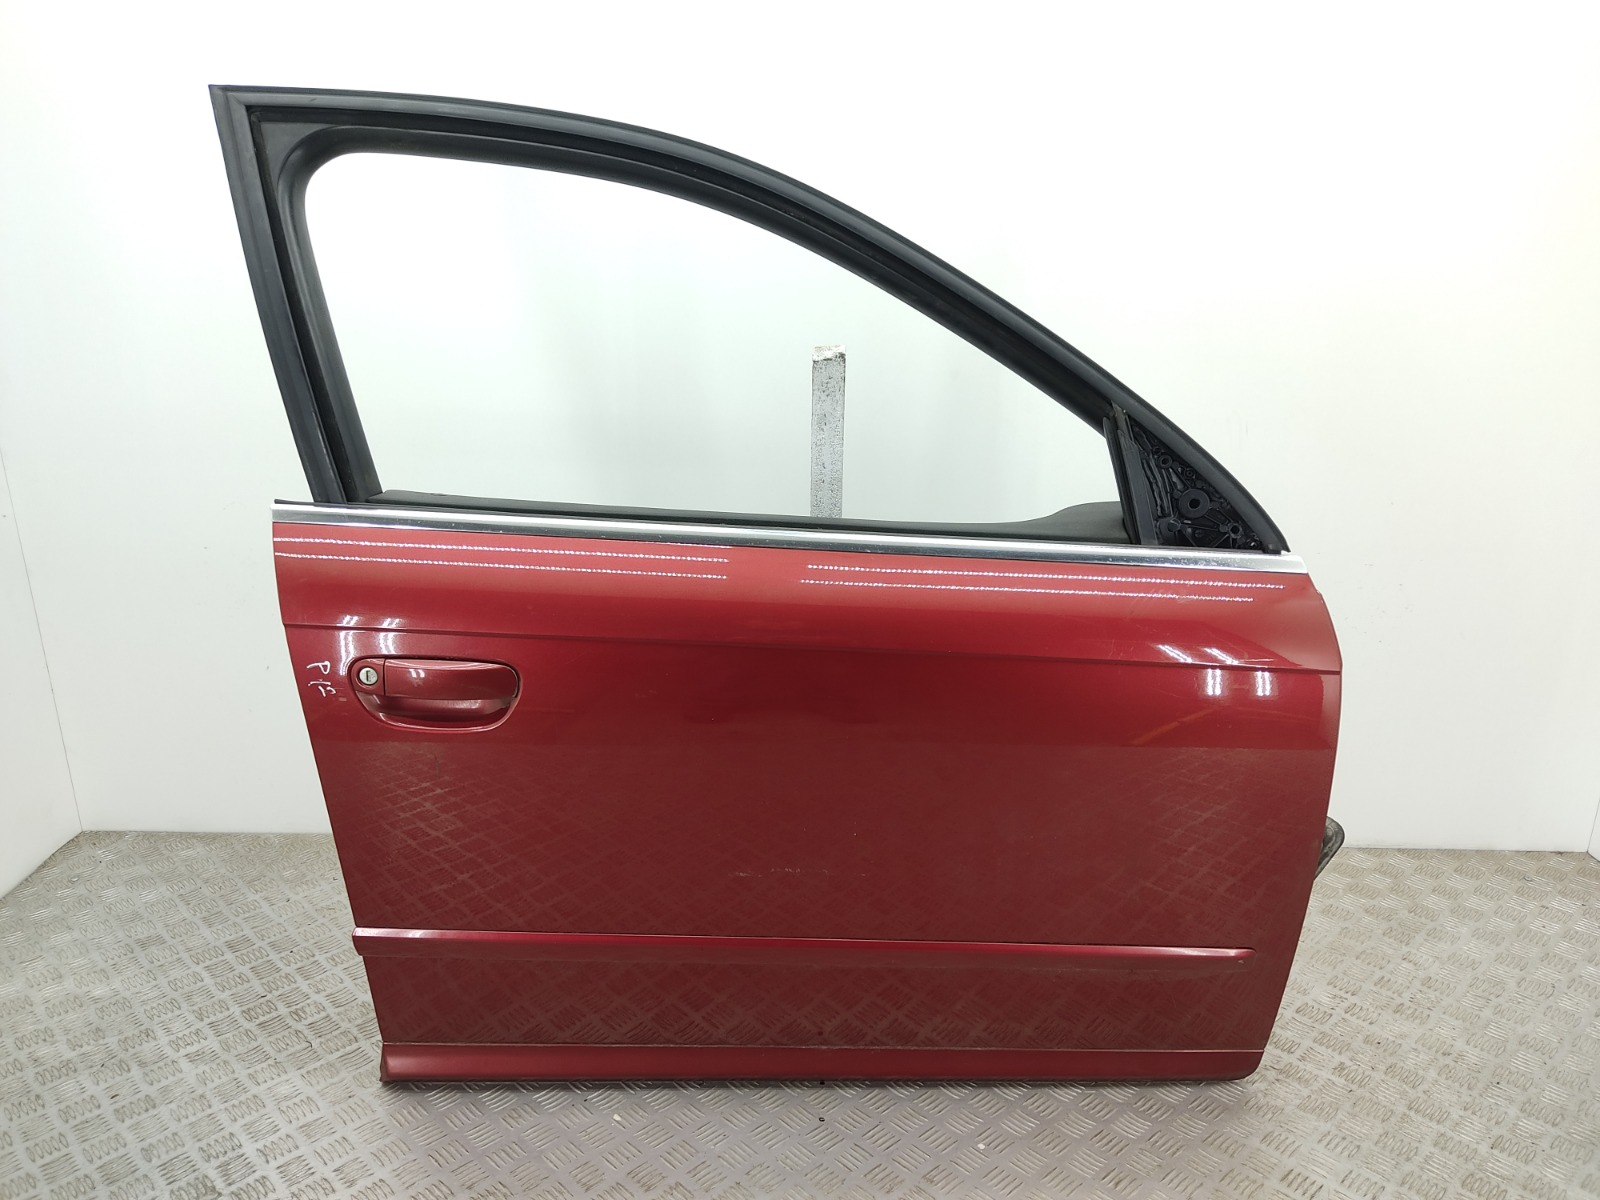 Дверь передняя правая Audi A4 B7 3.0 TDI 2006 (б/у)